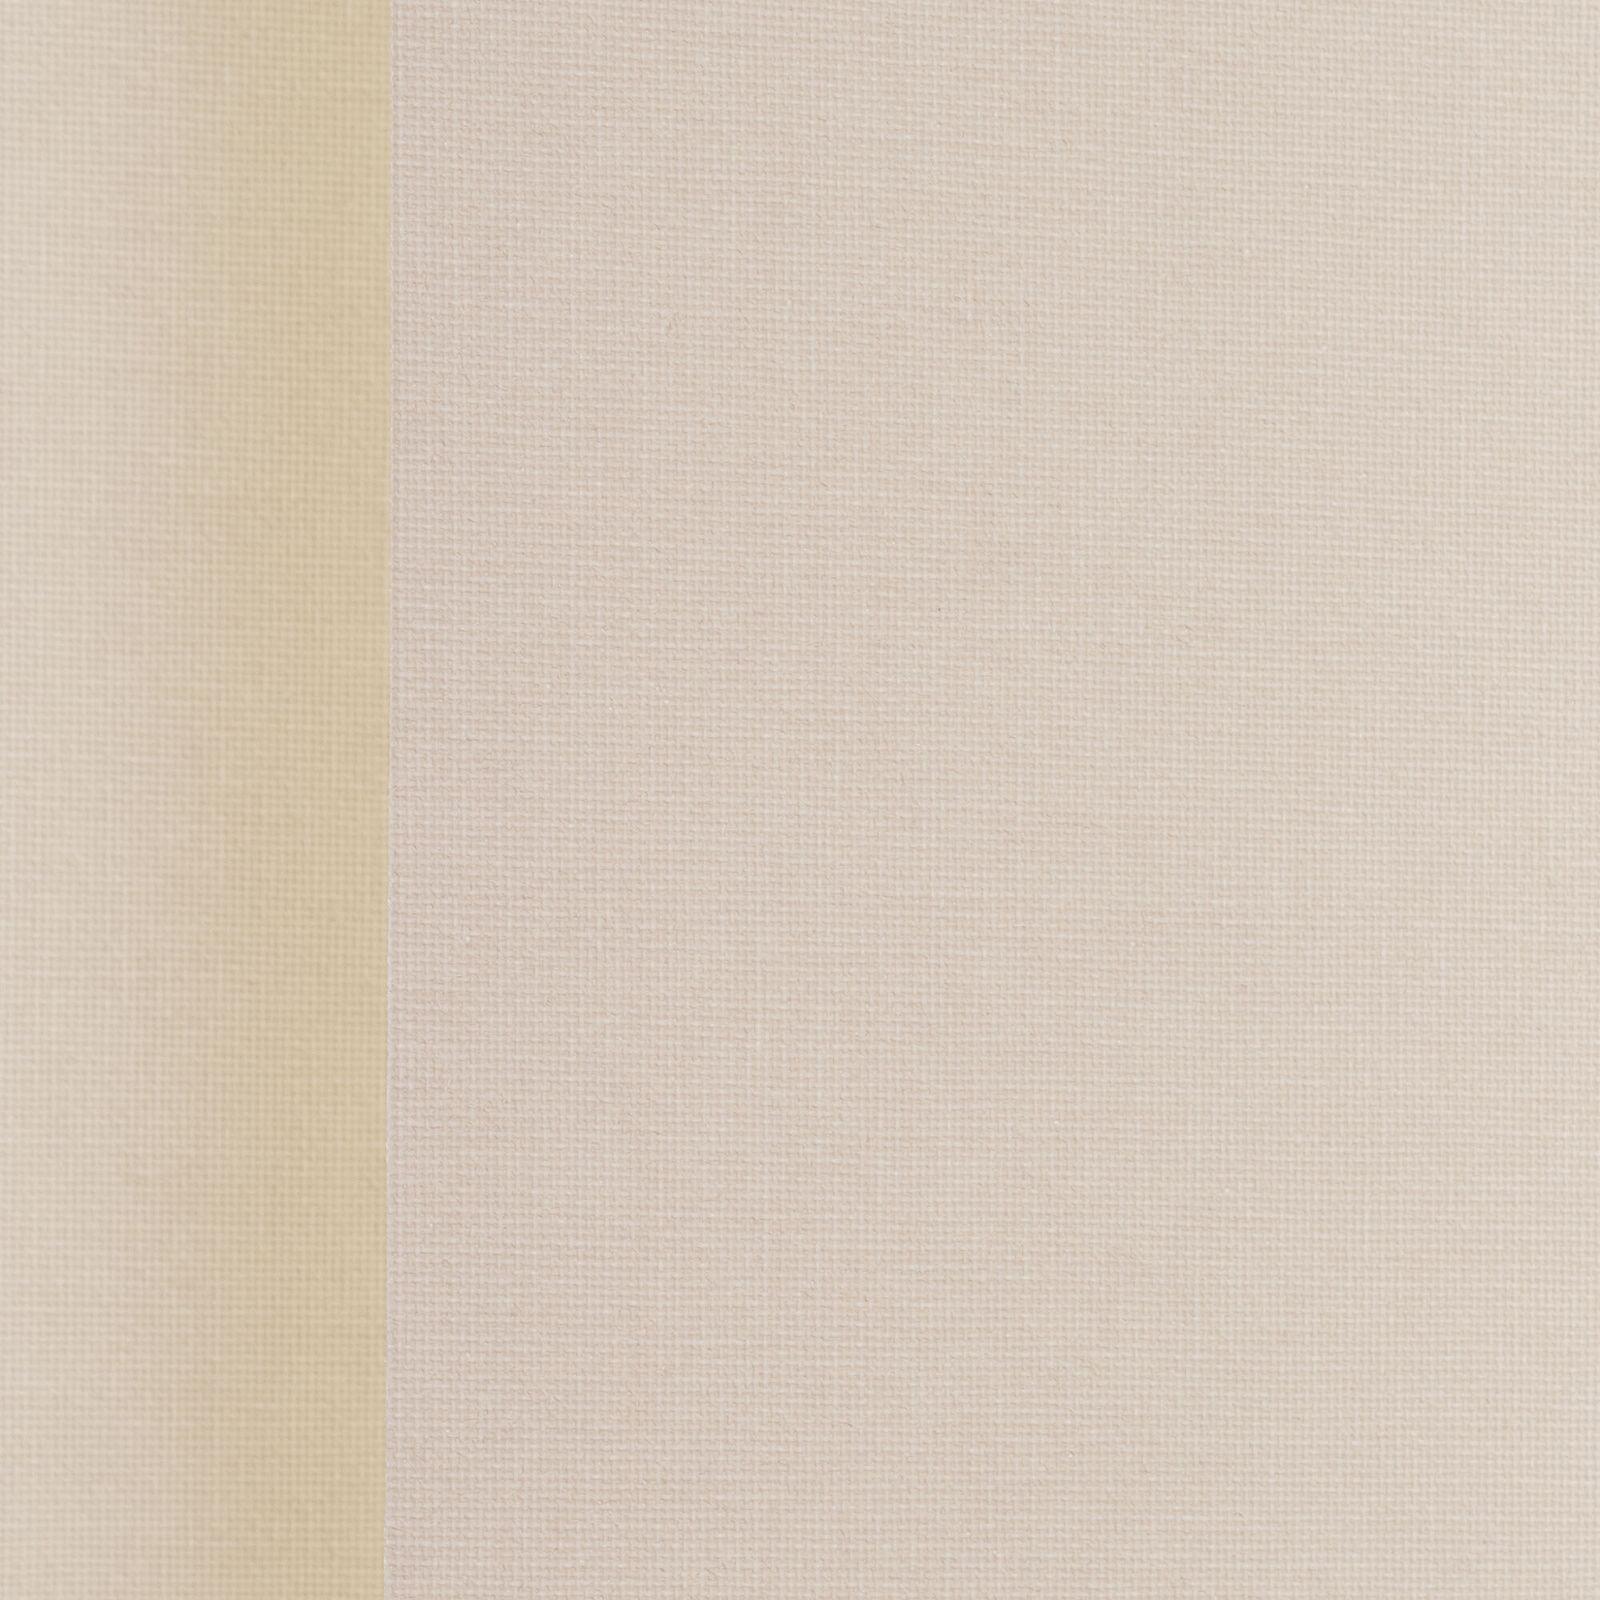 LIEDECO Grünikal-Lamellenanlage Perlreflex, 127 mm Lamellen, lichtdurchlässig, lichtdurchlässig, lichtdurchlässig, F 05ae7a